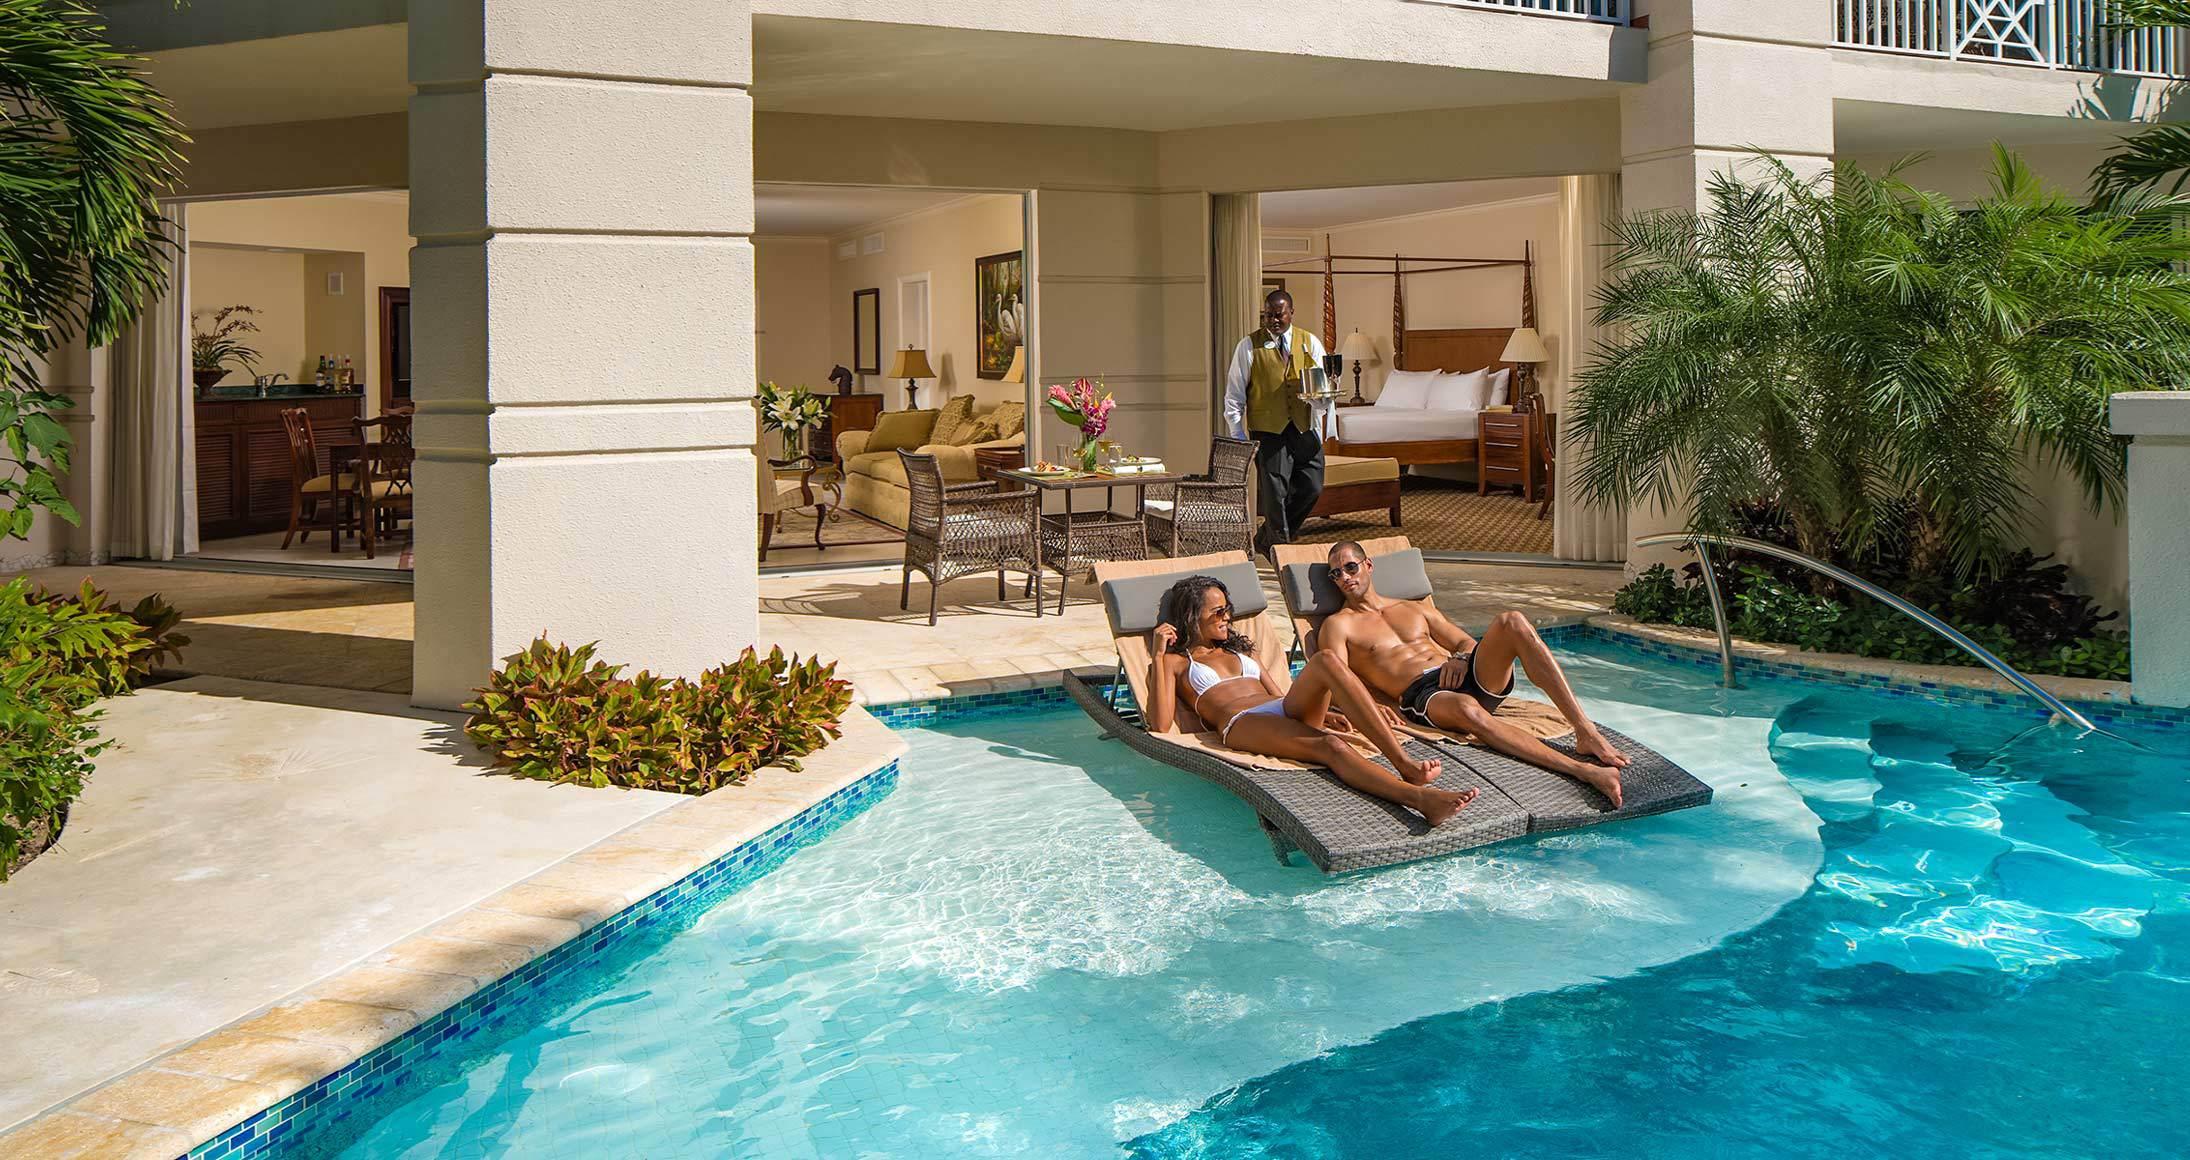 Sandals Royal Bahamian Luxury Resort in Nassau | Sandals